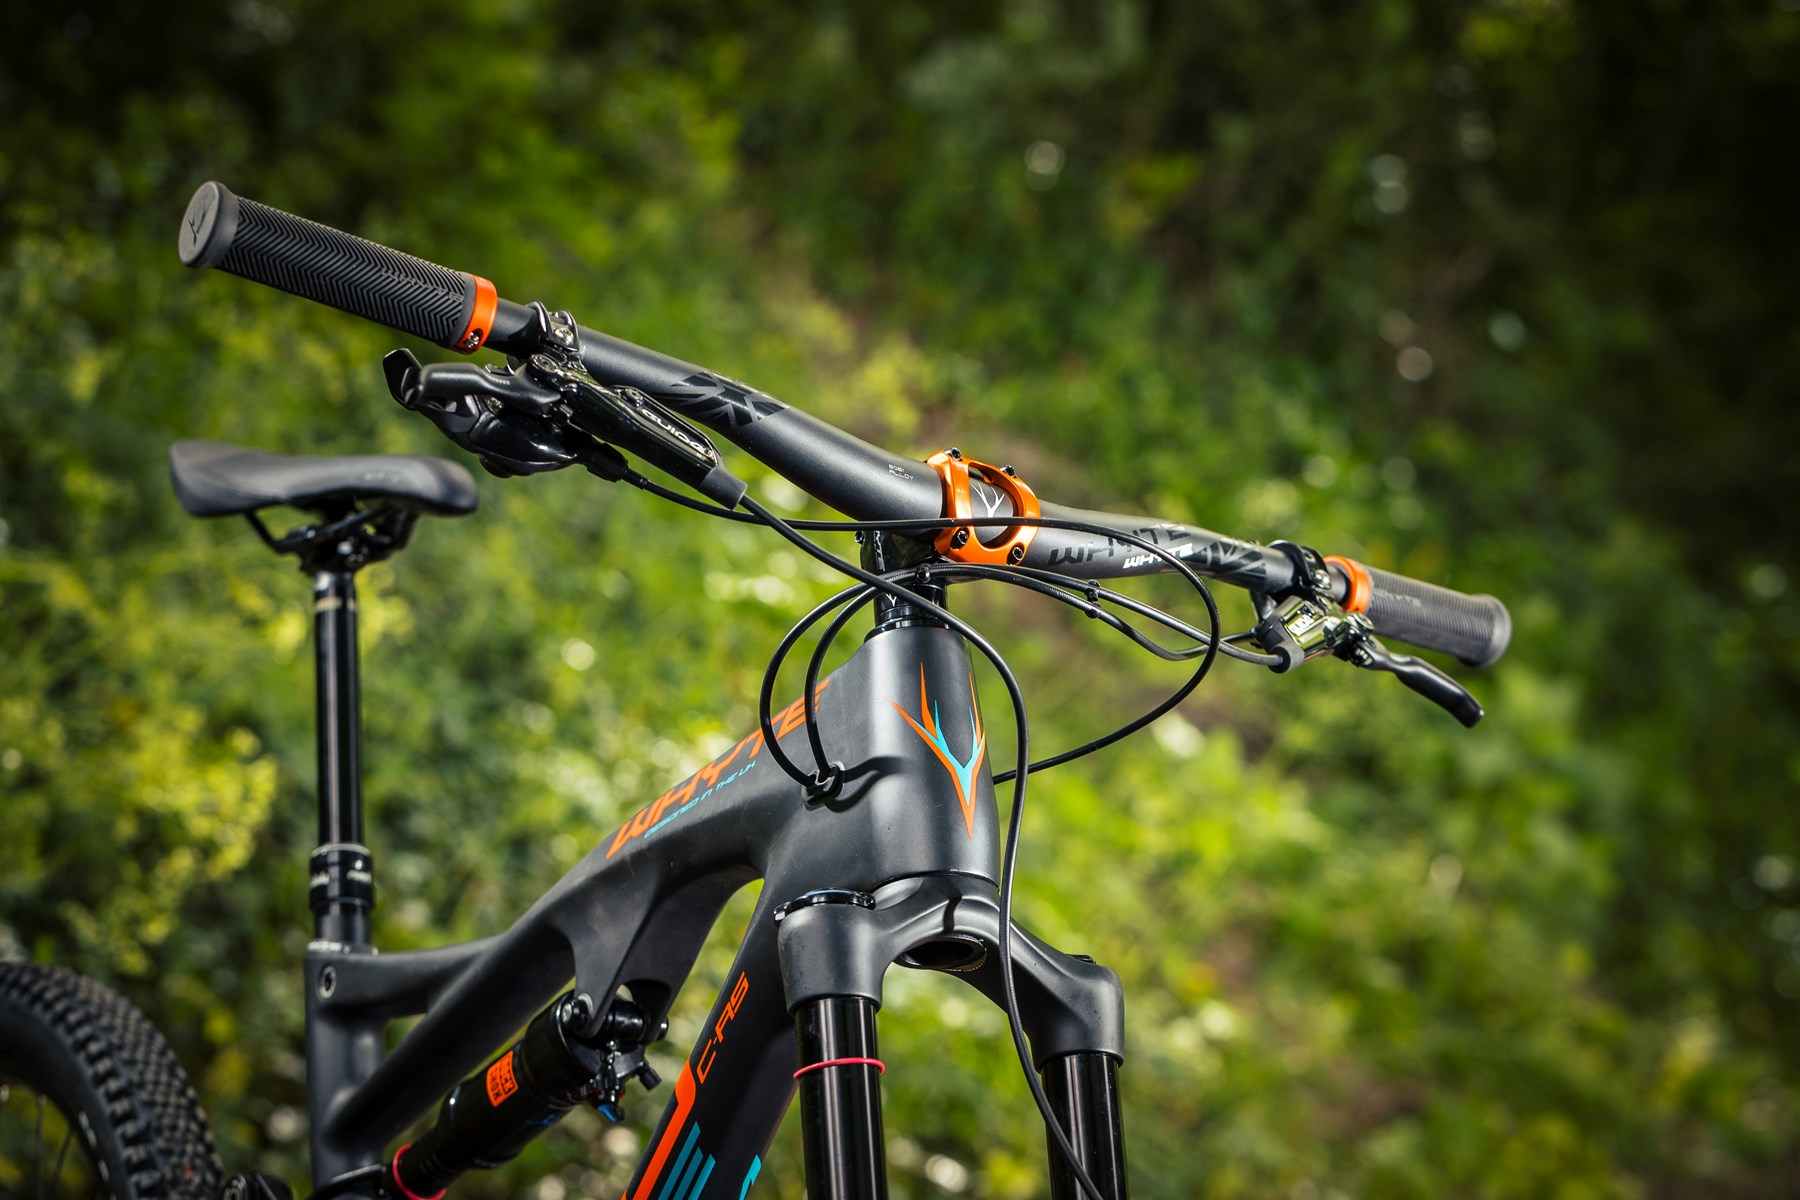 2018 Whyte G 170 RS Gravity Enduro Full Suspension Mountain Bike